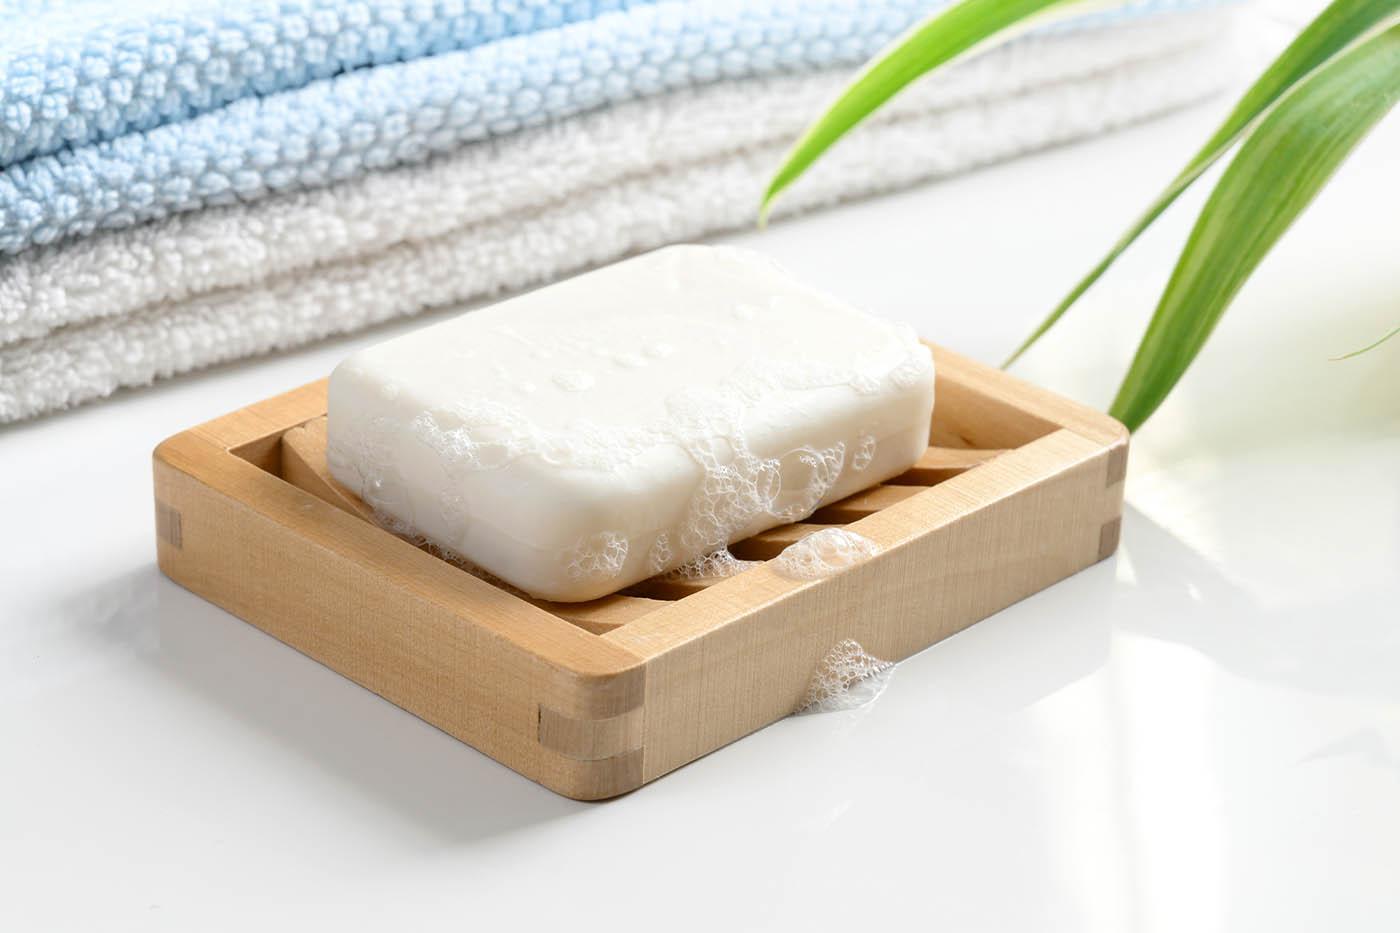 HUL & Godrej Consumer increase prices of soaps